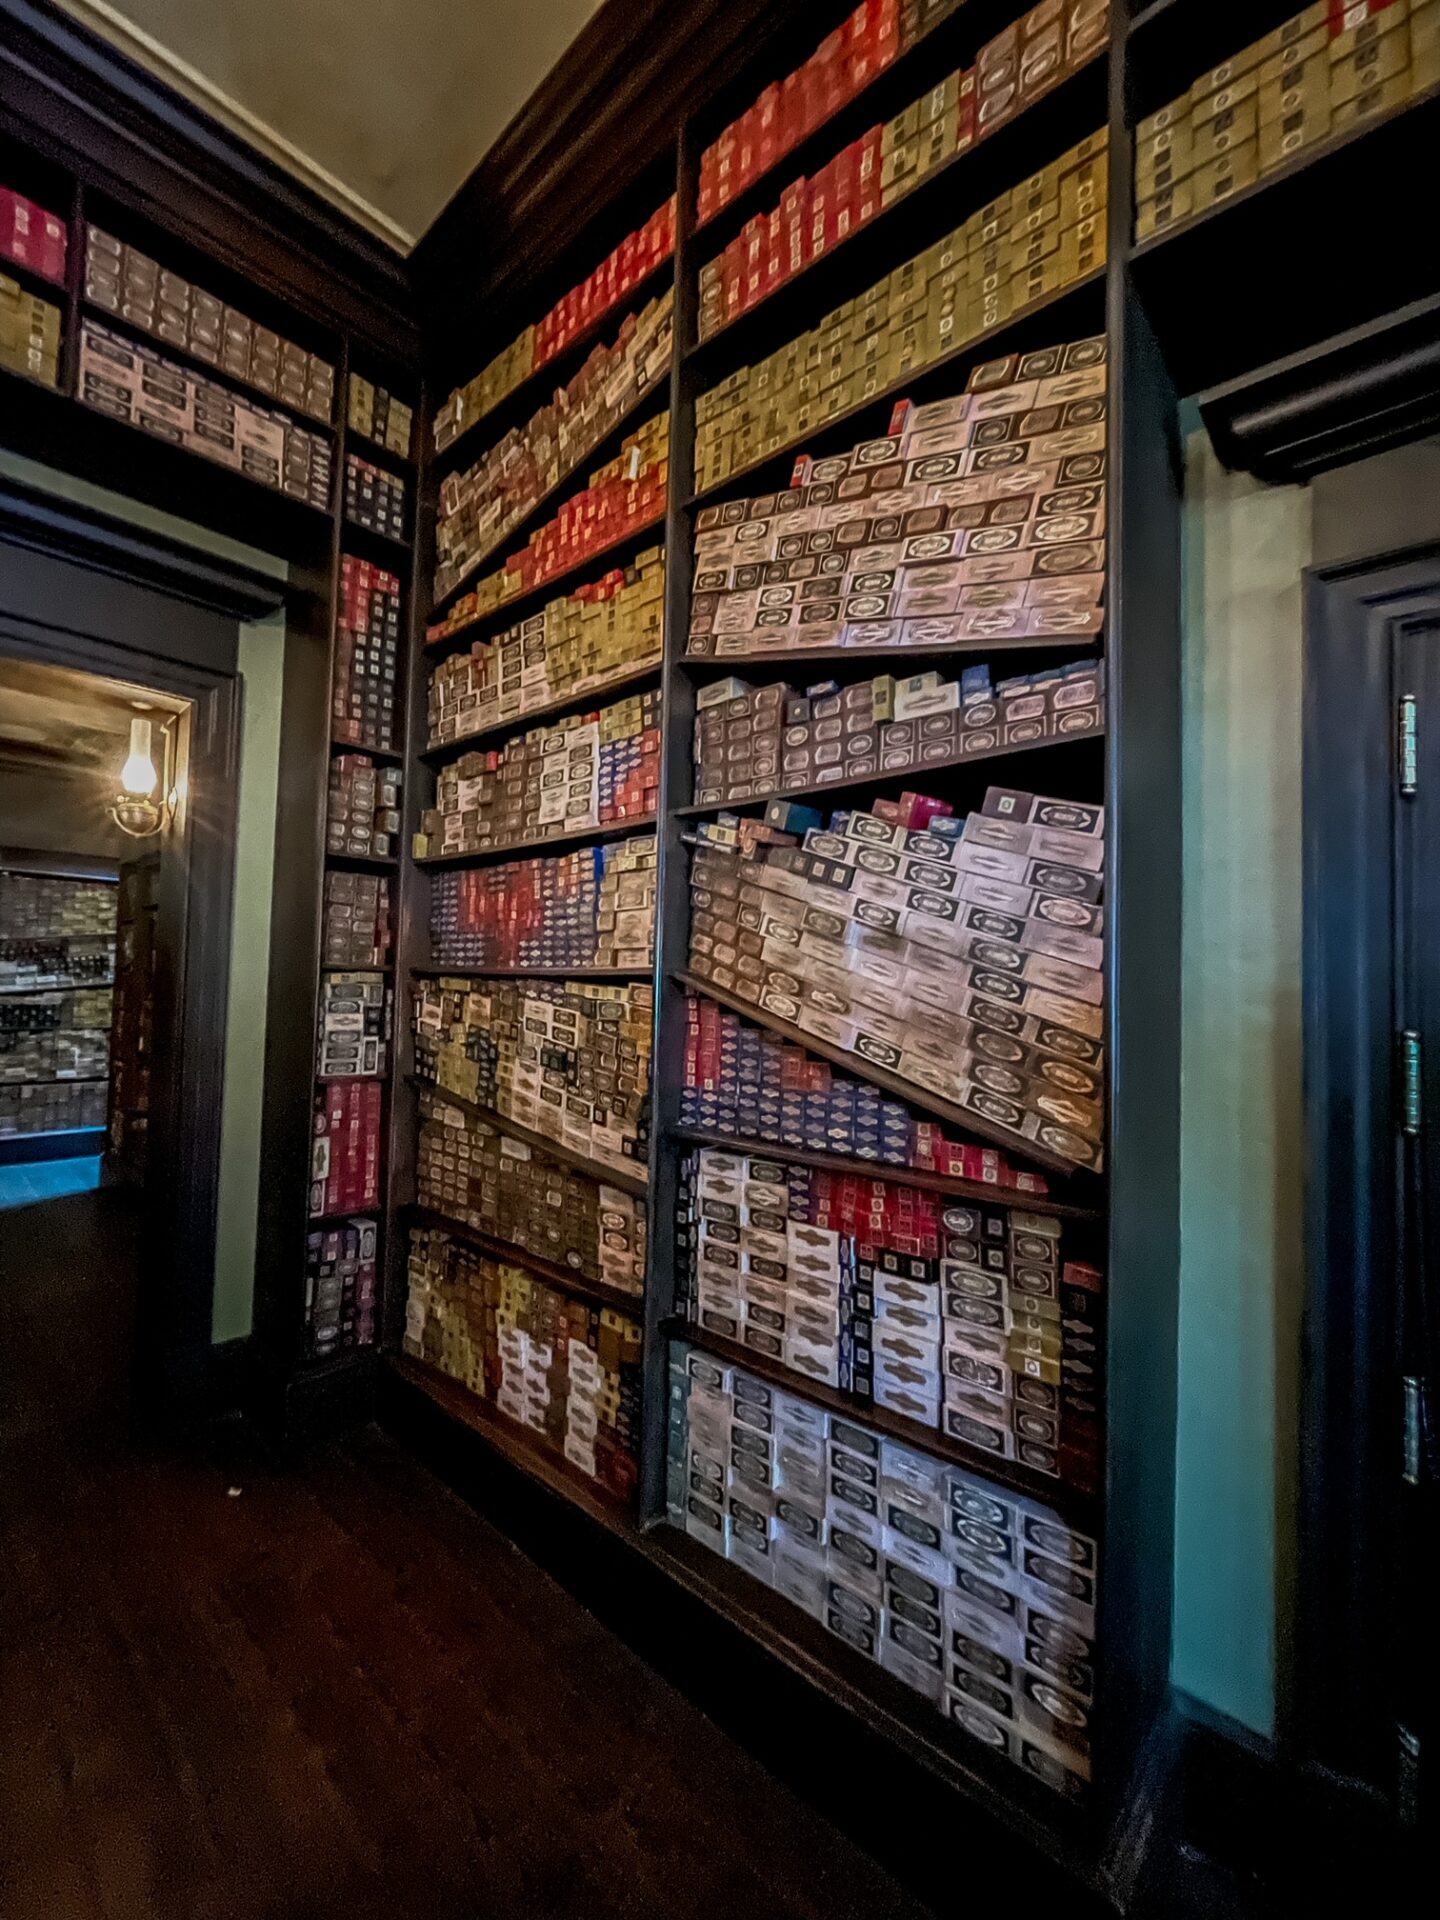 Ollivander's Wand Experience at Harry Potter World Universal Studios Orlando